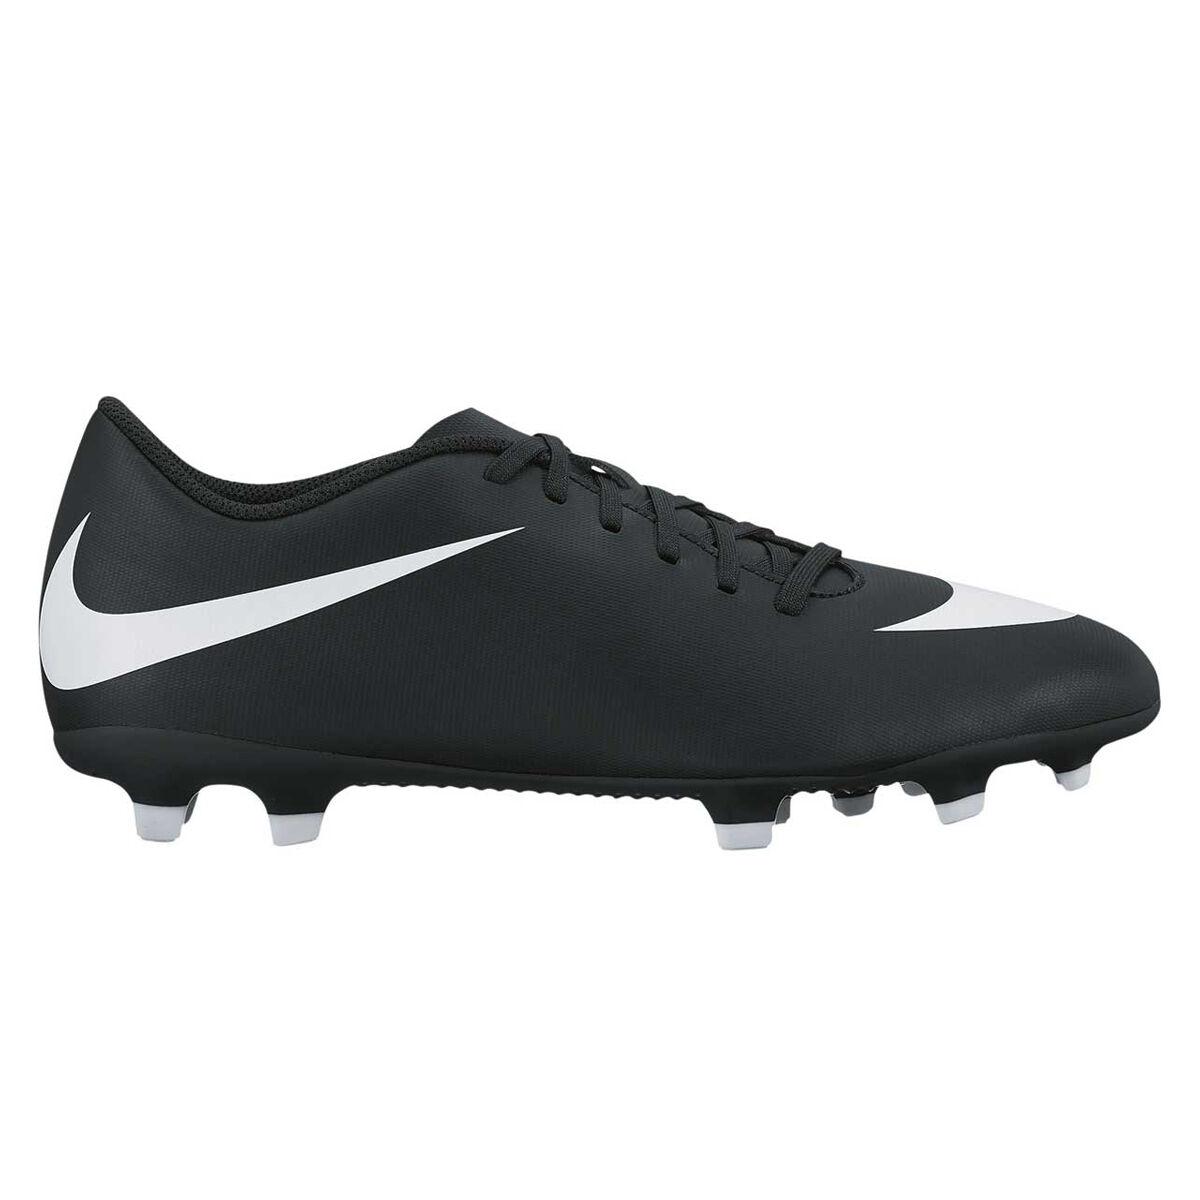 Nike Bravata II Mens Football Boots